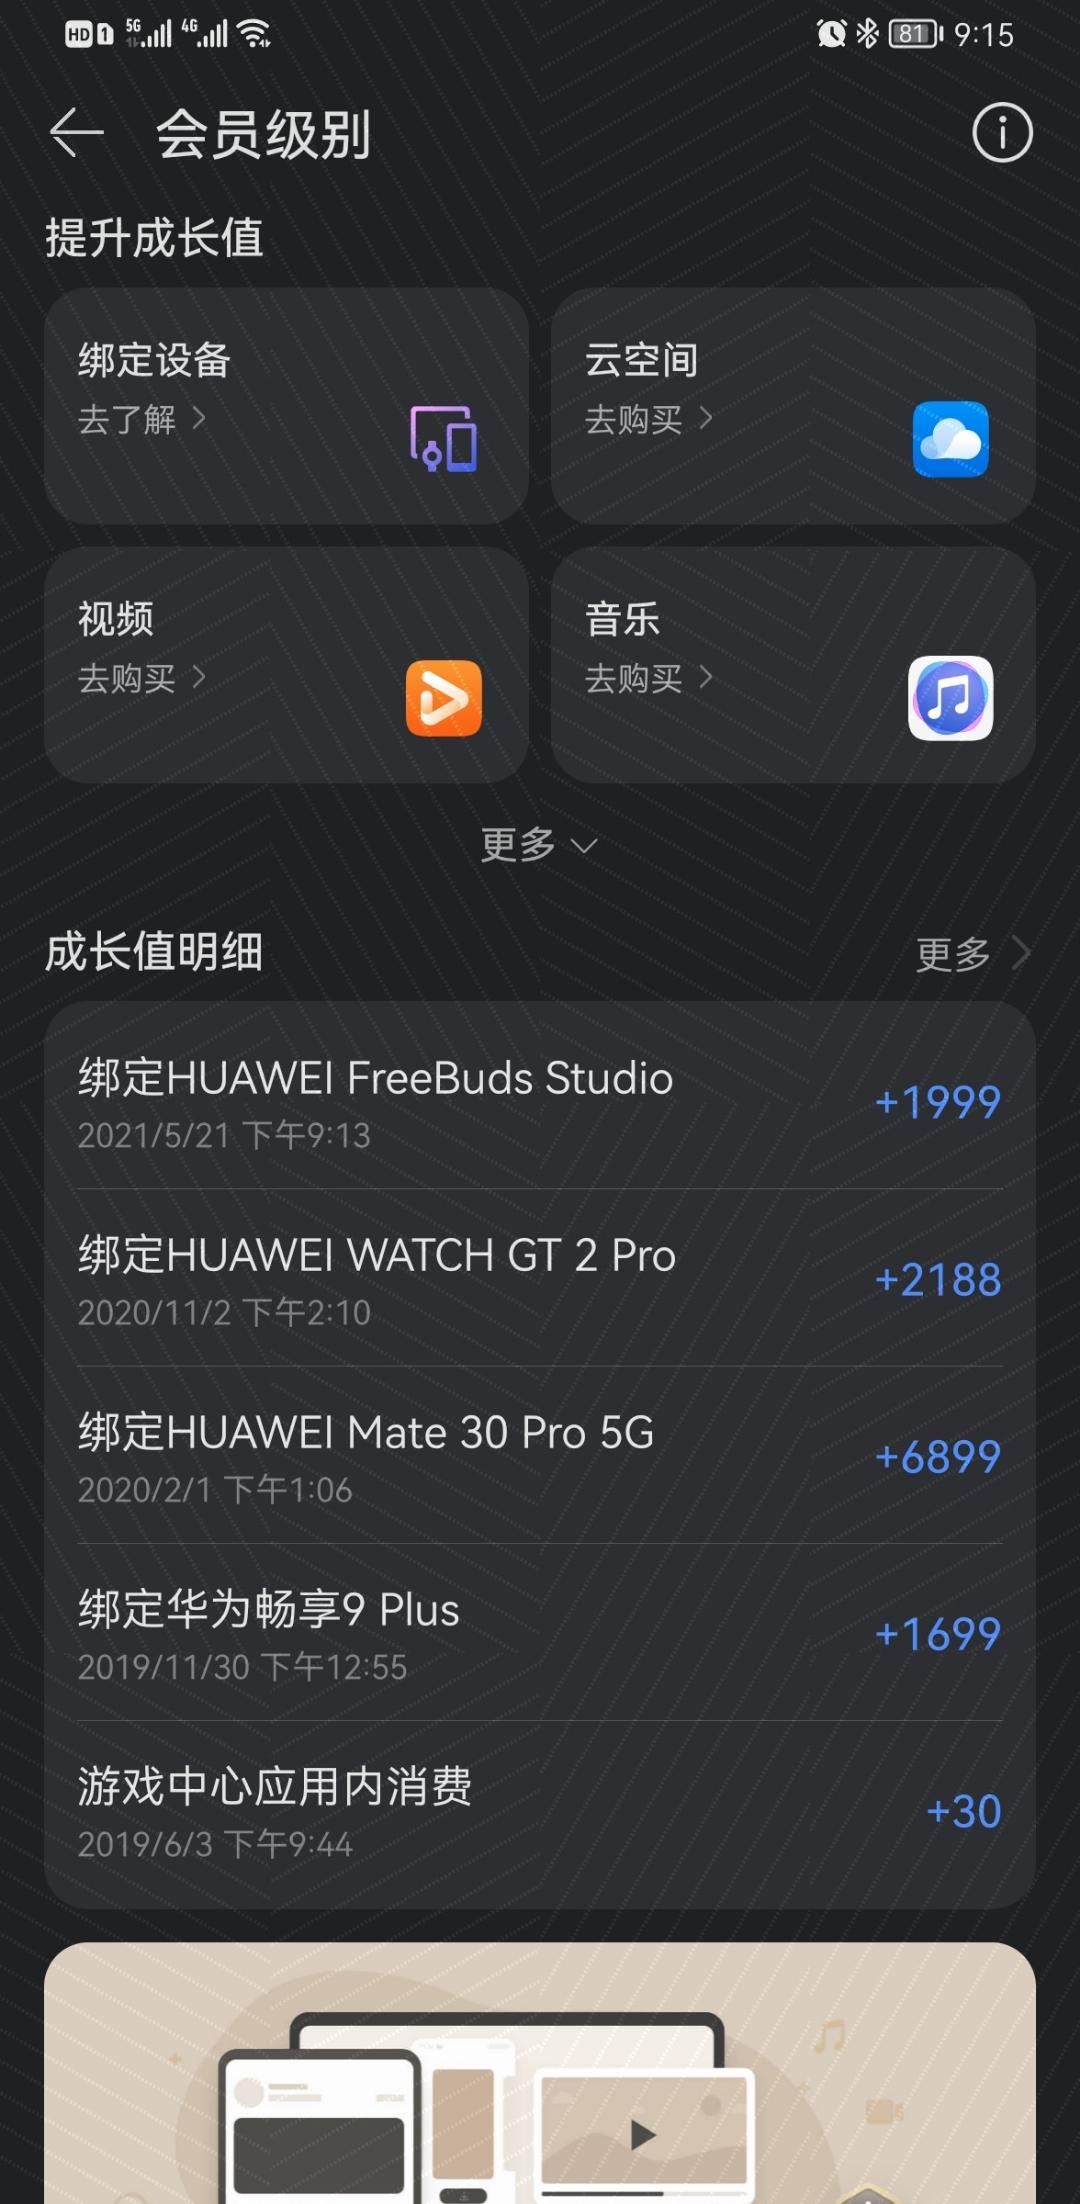 Screenshot_20210521_211535_com.huawei.mycenter.jpg